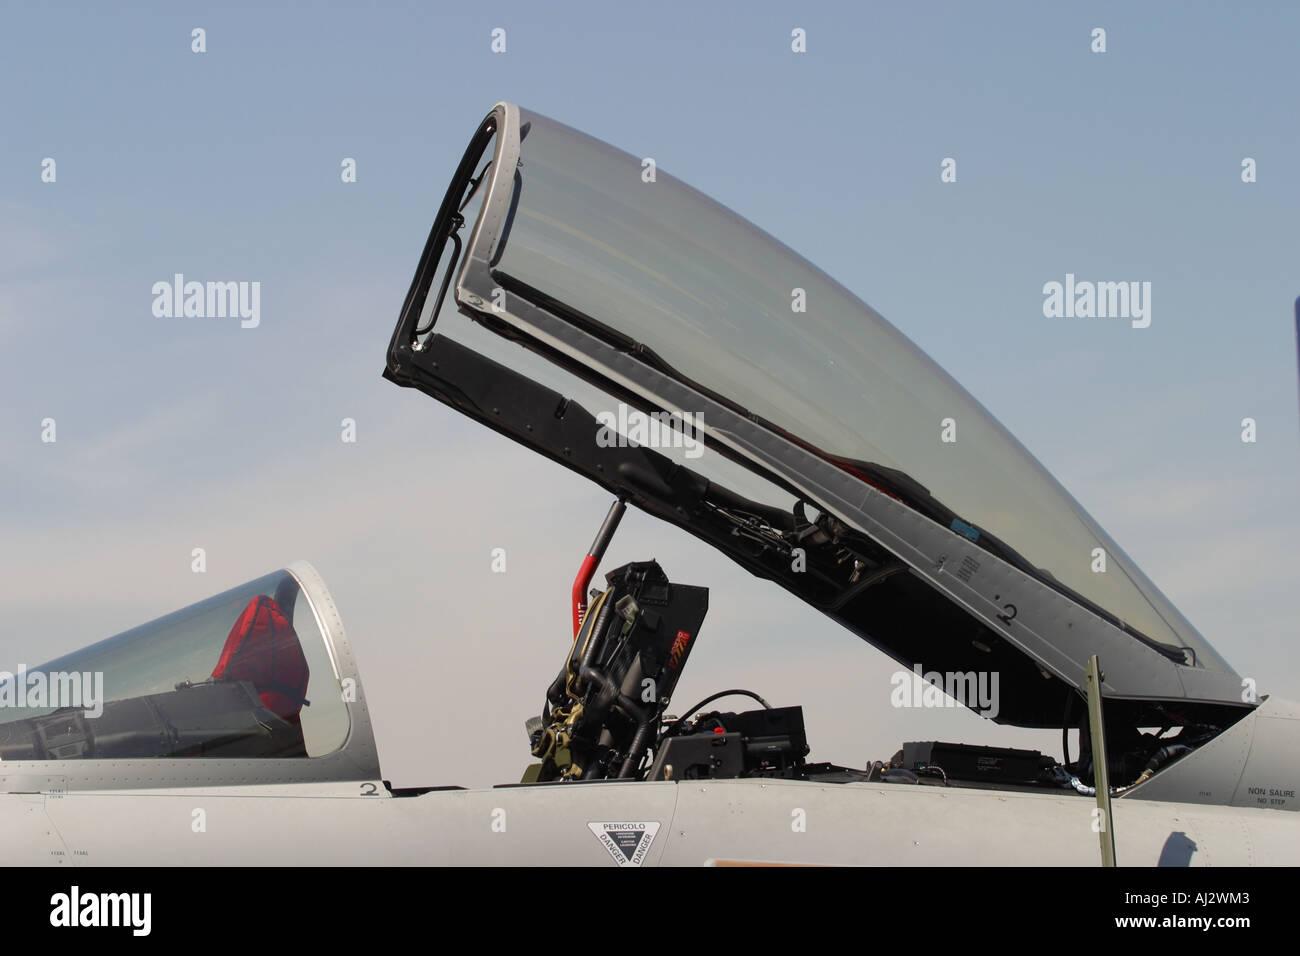 Eurofighter Typhoon Jet Fighter Interceptor Cockpit And